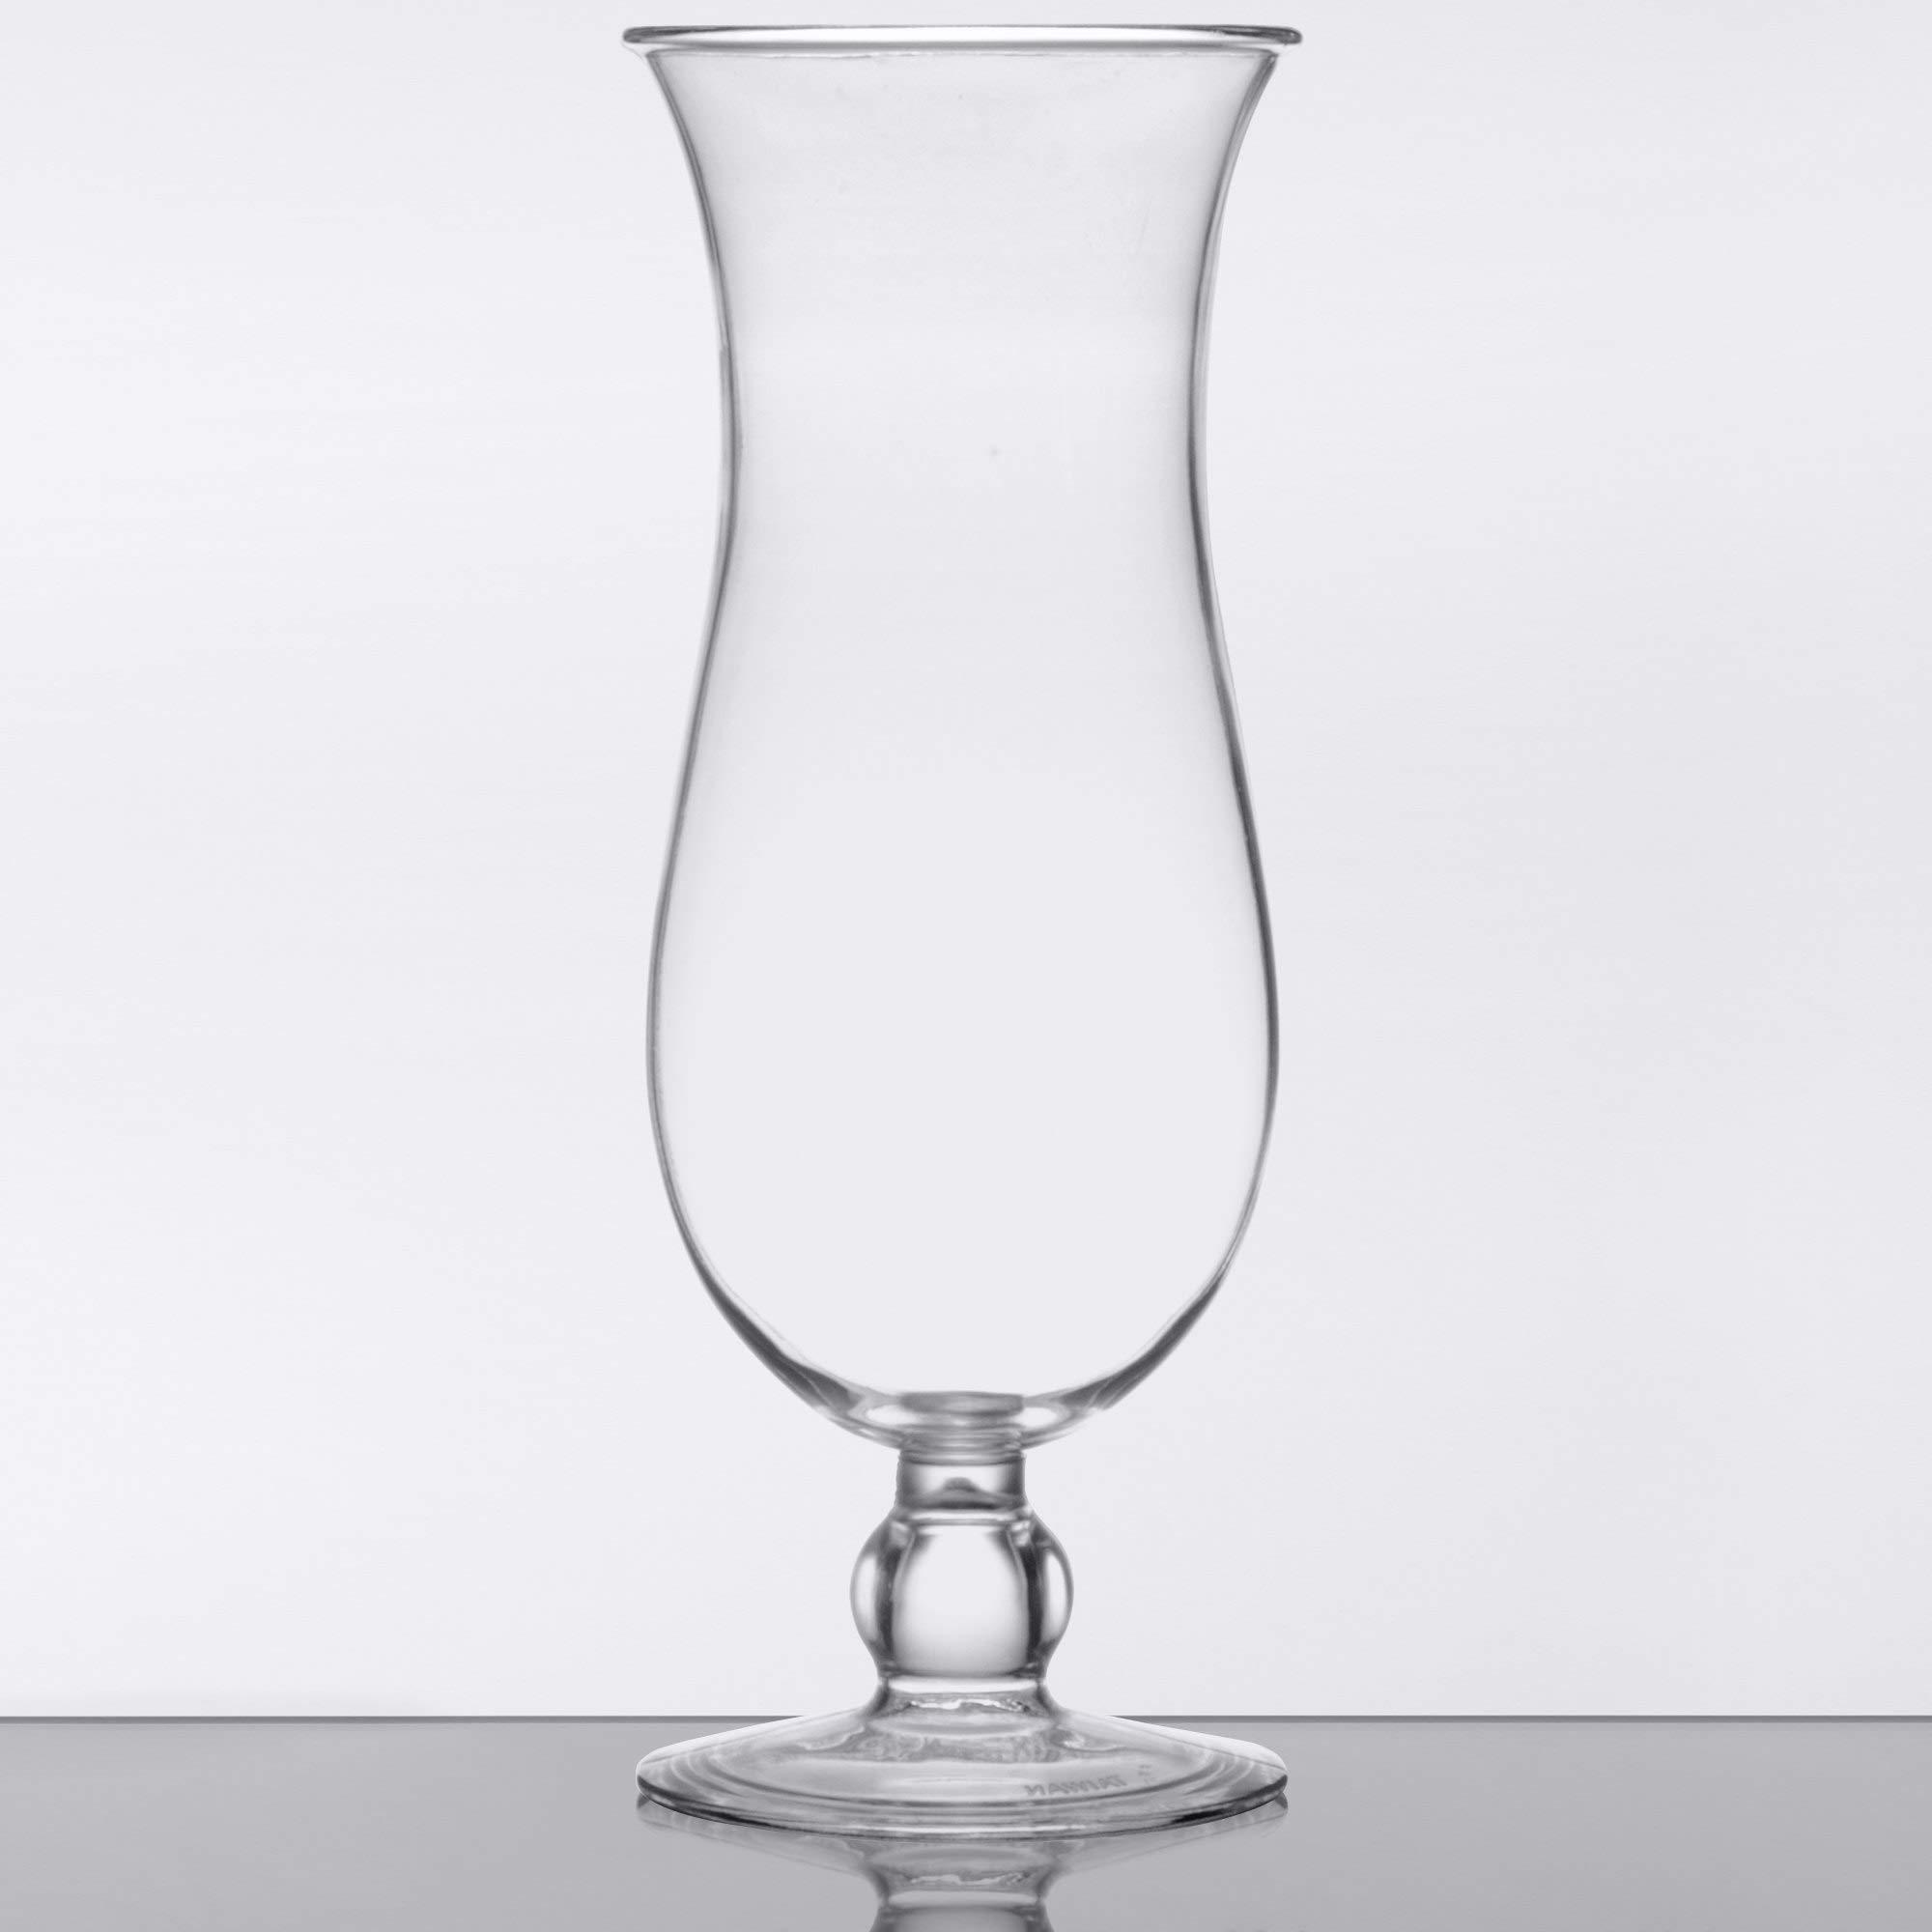 15 oz. Clear Plastic Hurricane Glasses, Break Resistant, Dishwasher Safe, Reusable, GET HUR-1-CL (Qty, 12)